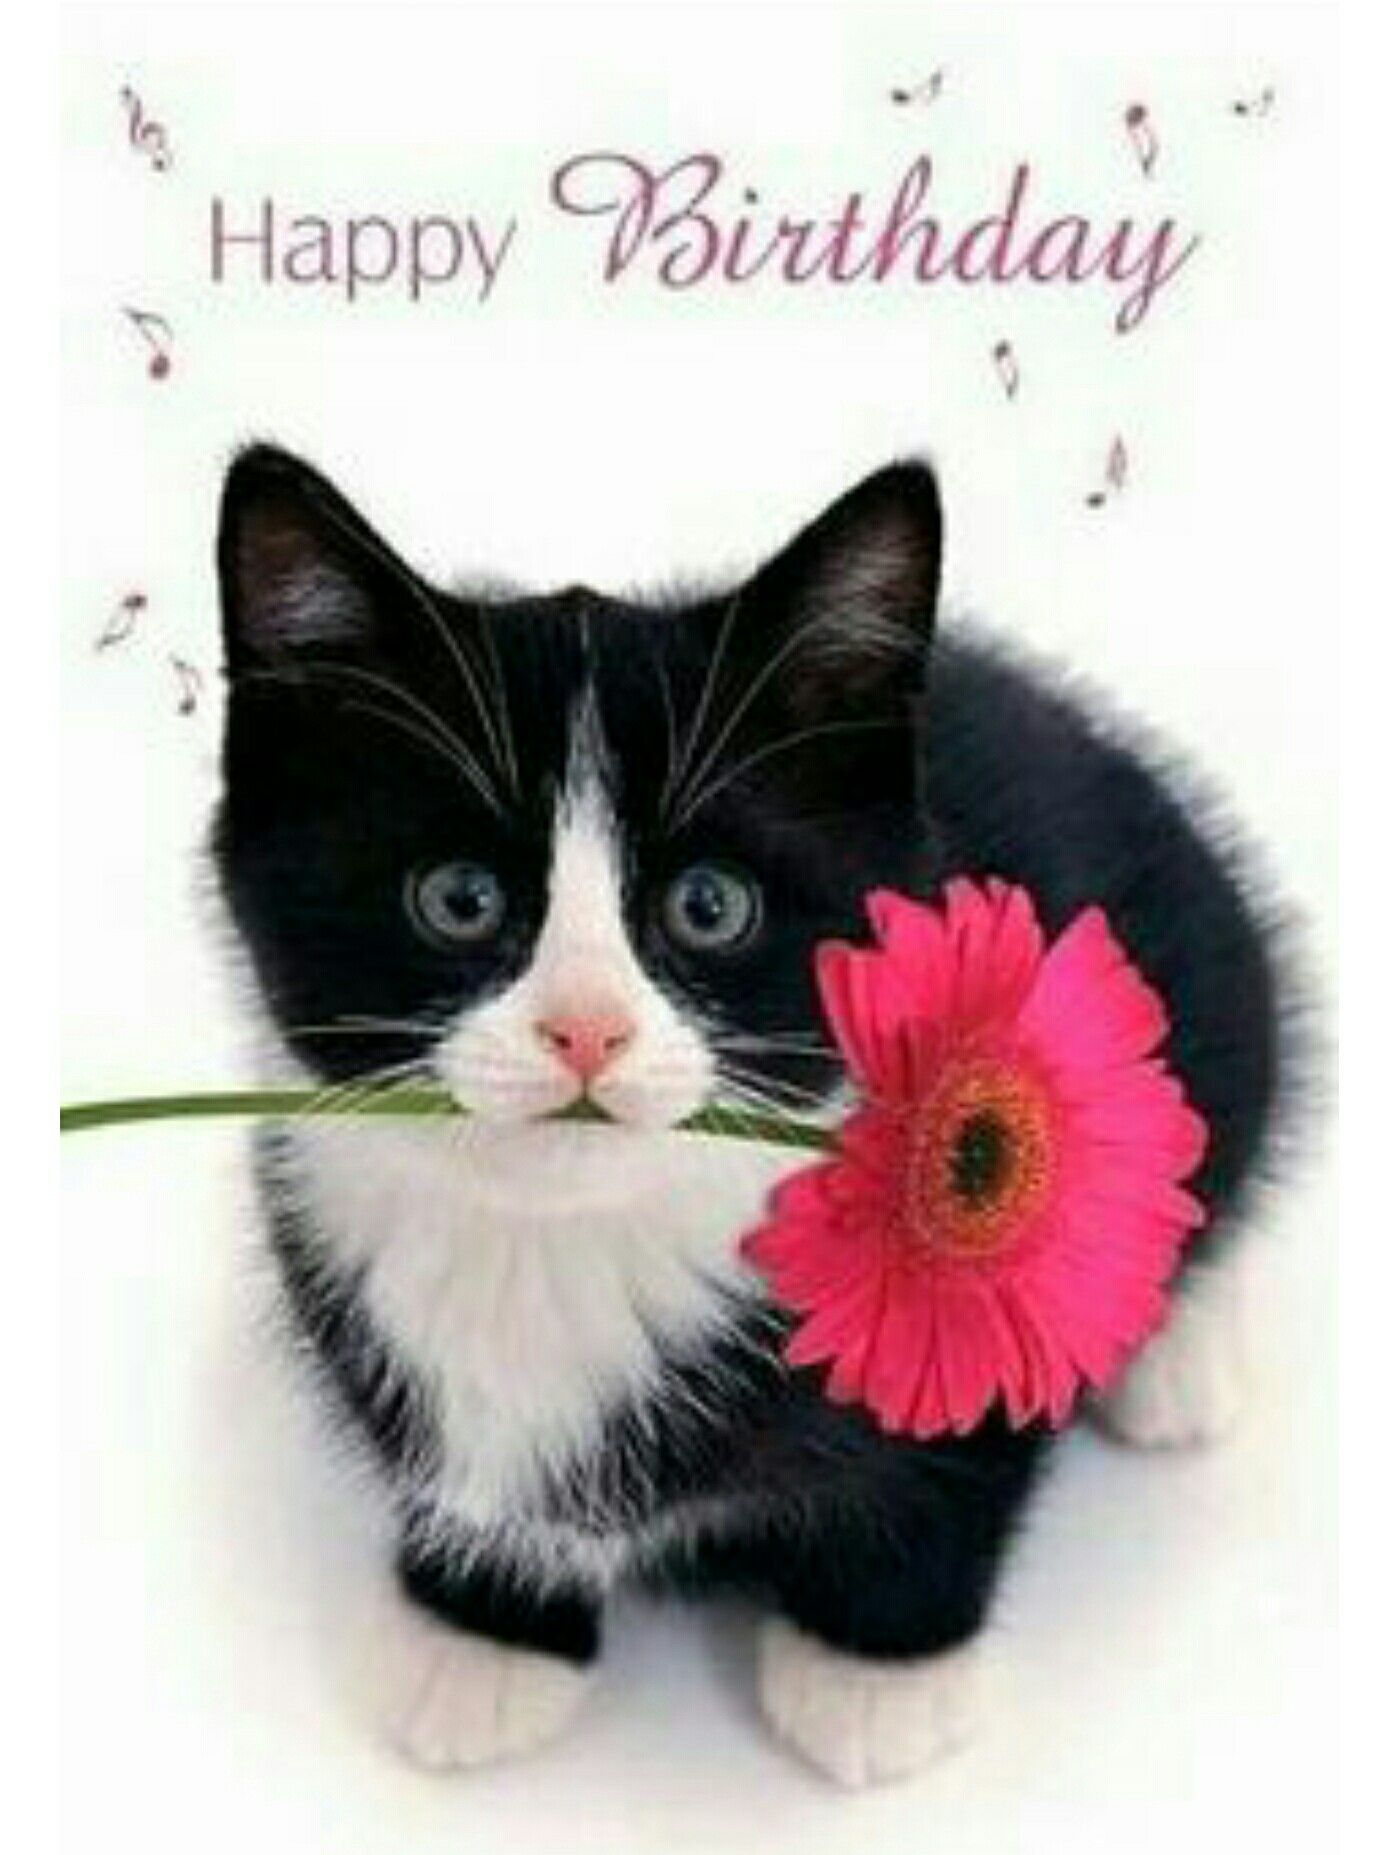 Astonishing Free Download Happy Birthday Cat Birthday Sayings Birthday Wishes Personalised Birthday Cards Epsylily Jamesorg